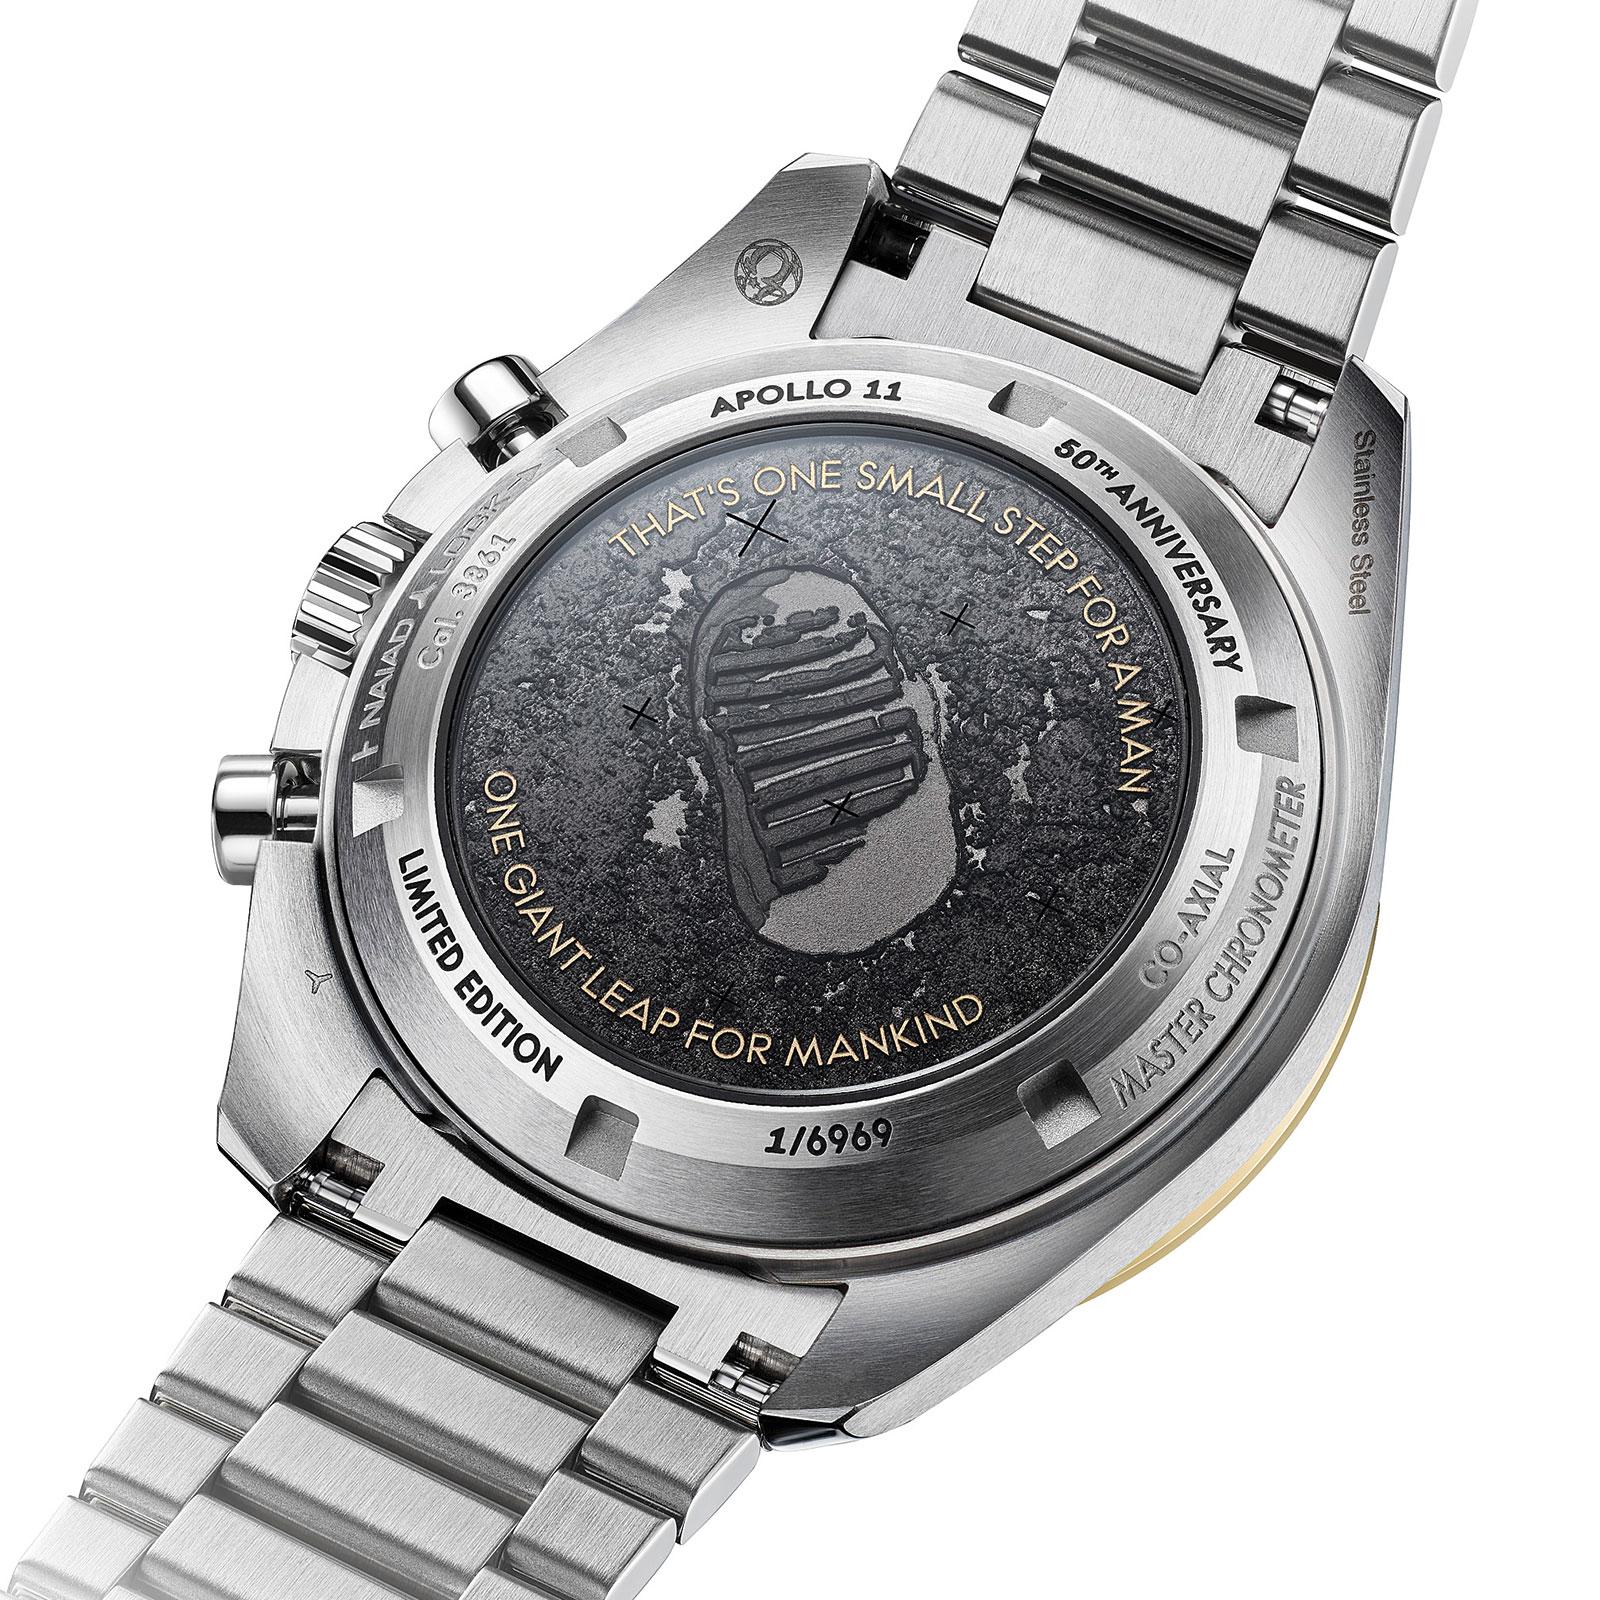 Omega Speedmaster Apollo 11 50th Anniversary 7